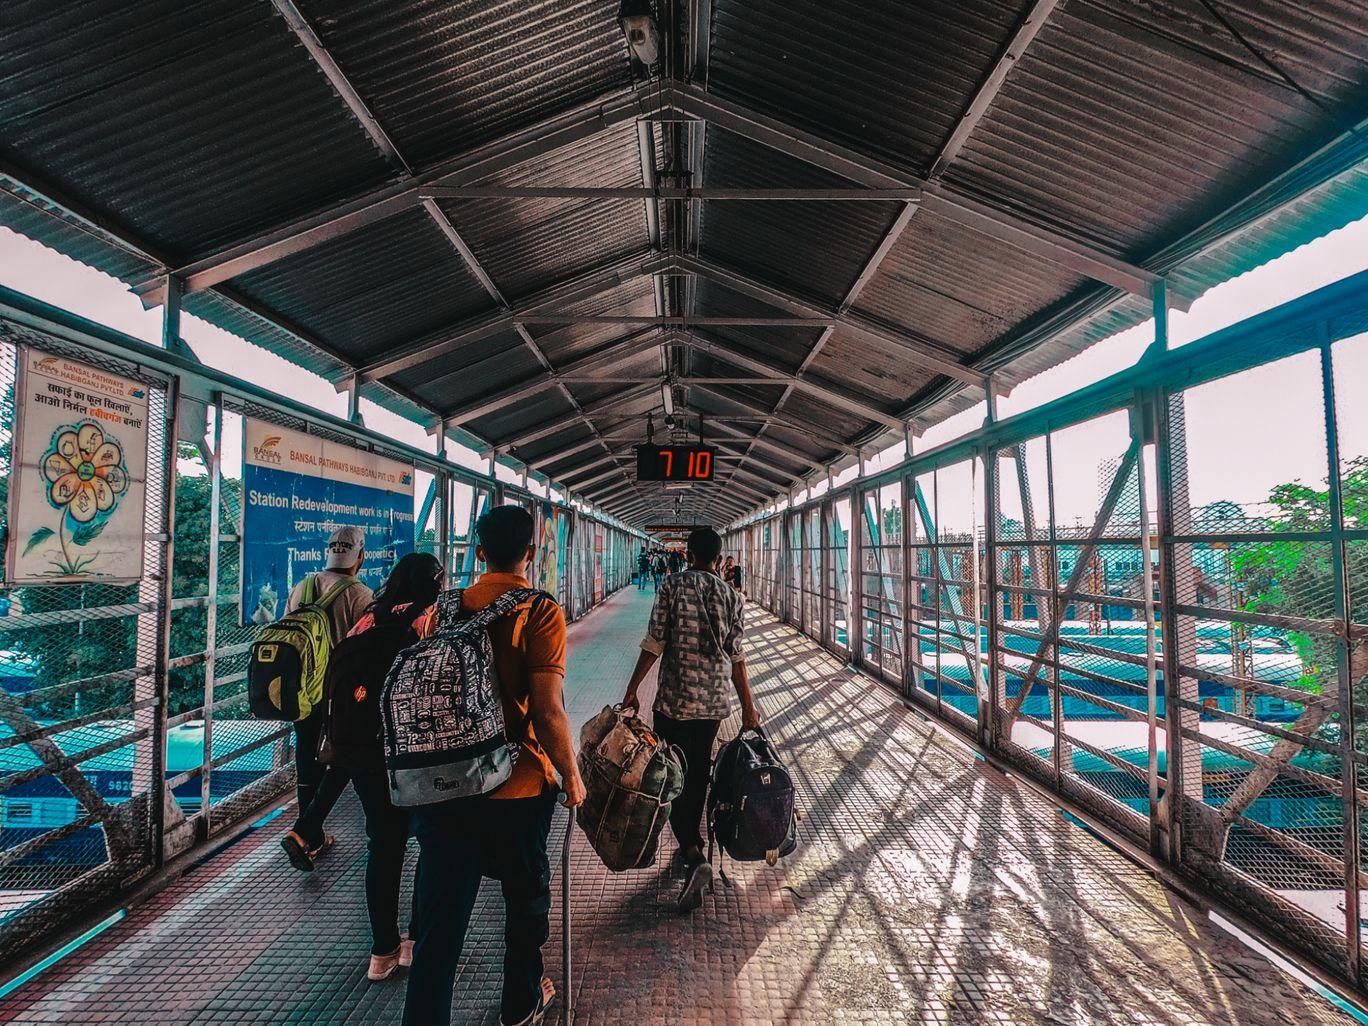 Photo of Habibganj Railway Station Platform 1 By Parmeshivam kumar